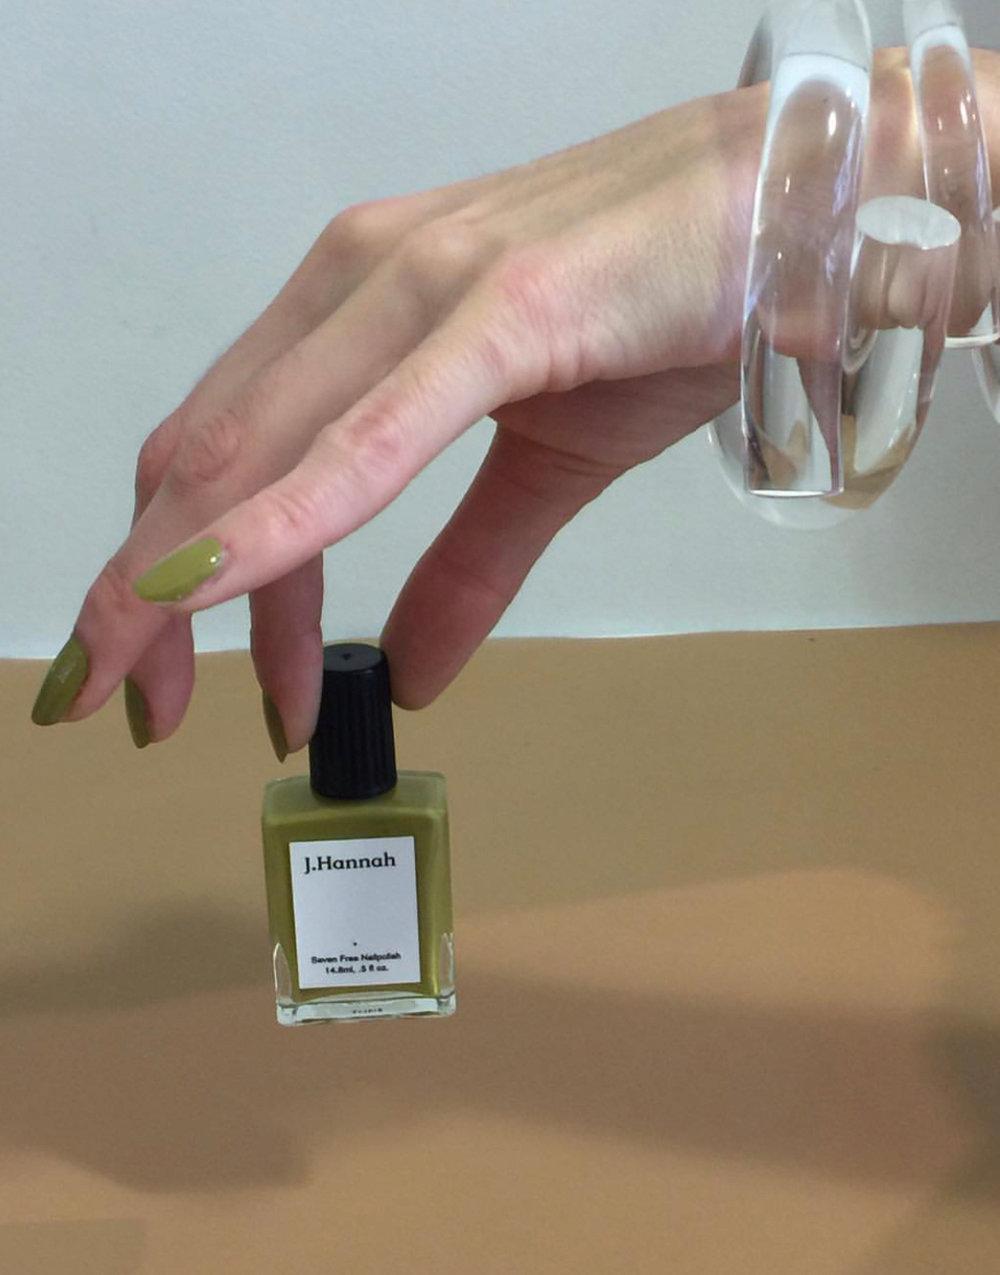 JH Eames polish, via @shoponeofafew on Instagram